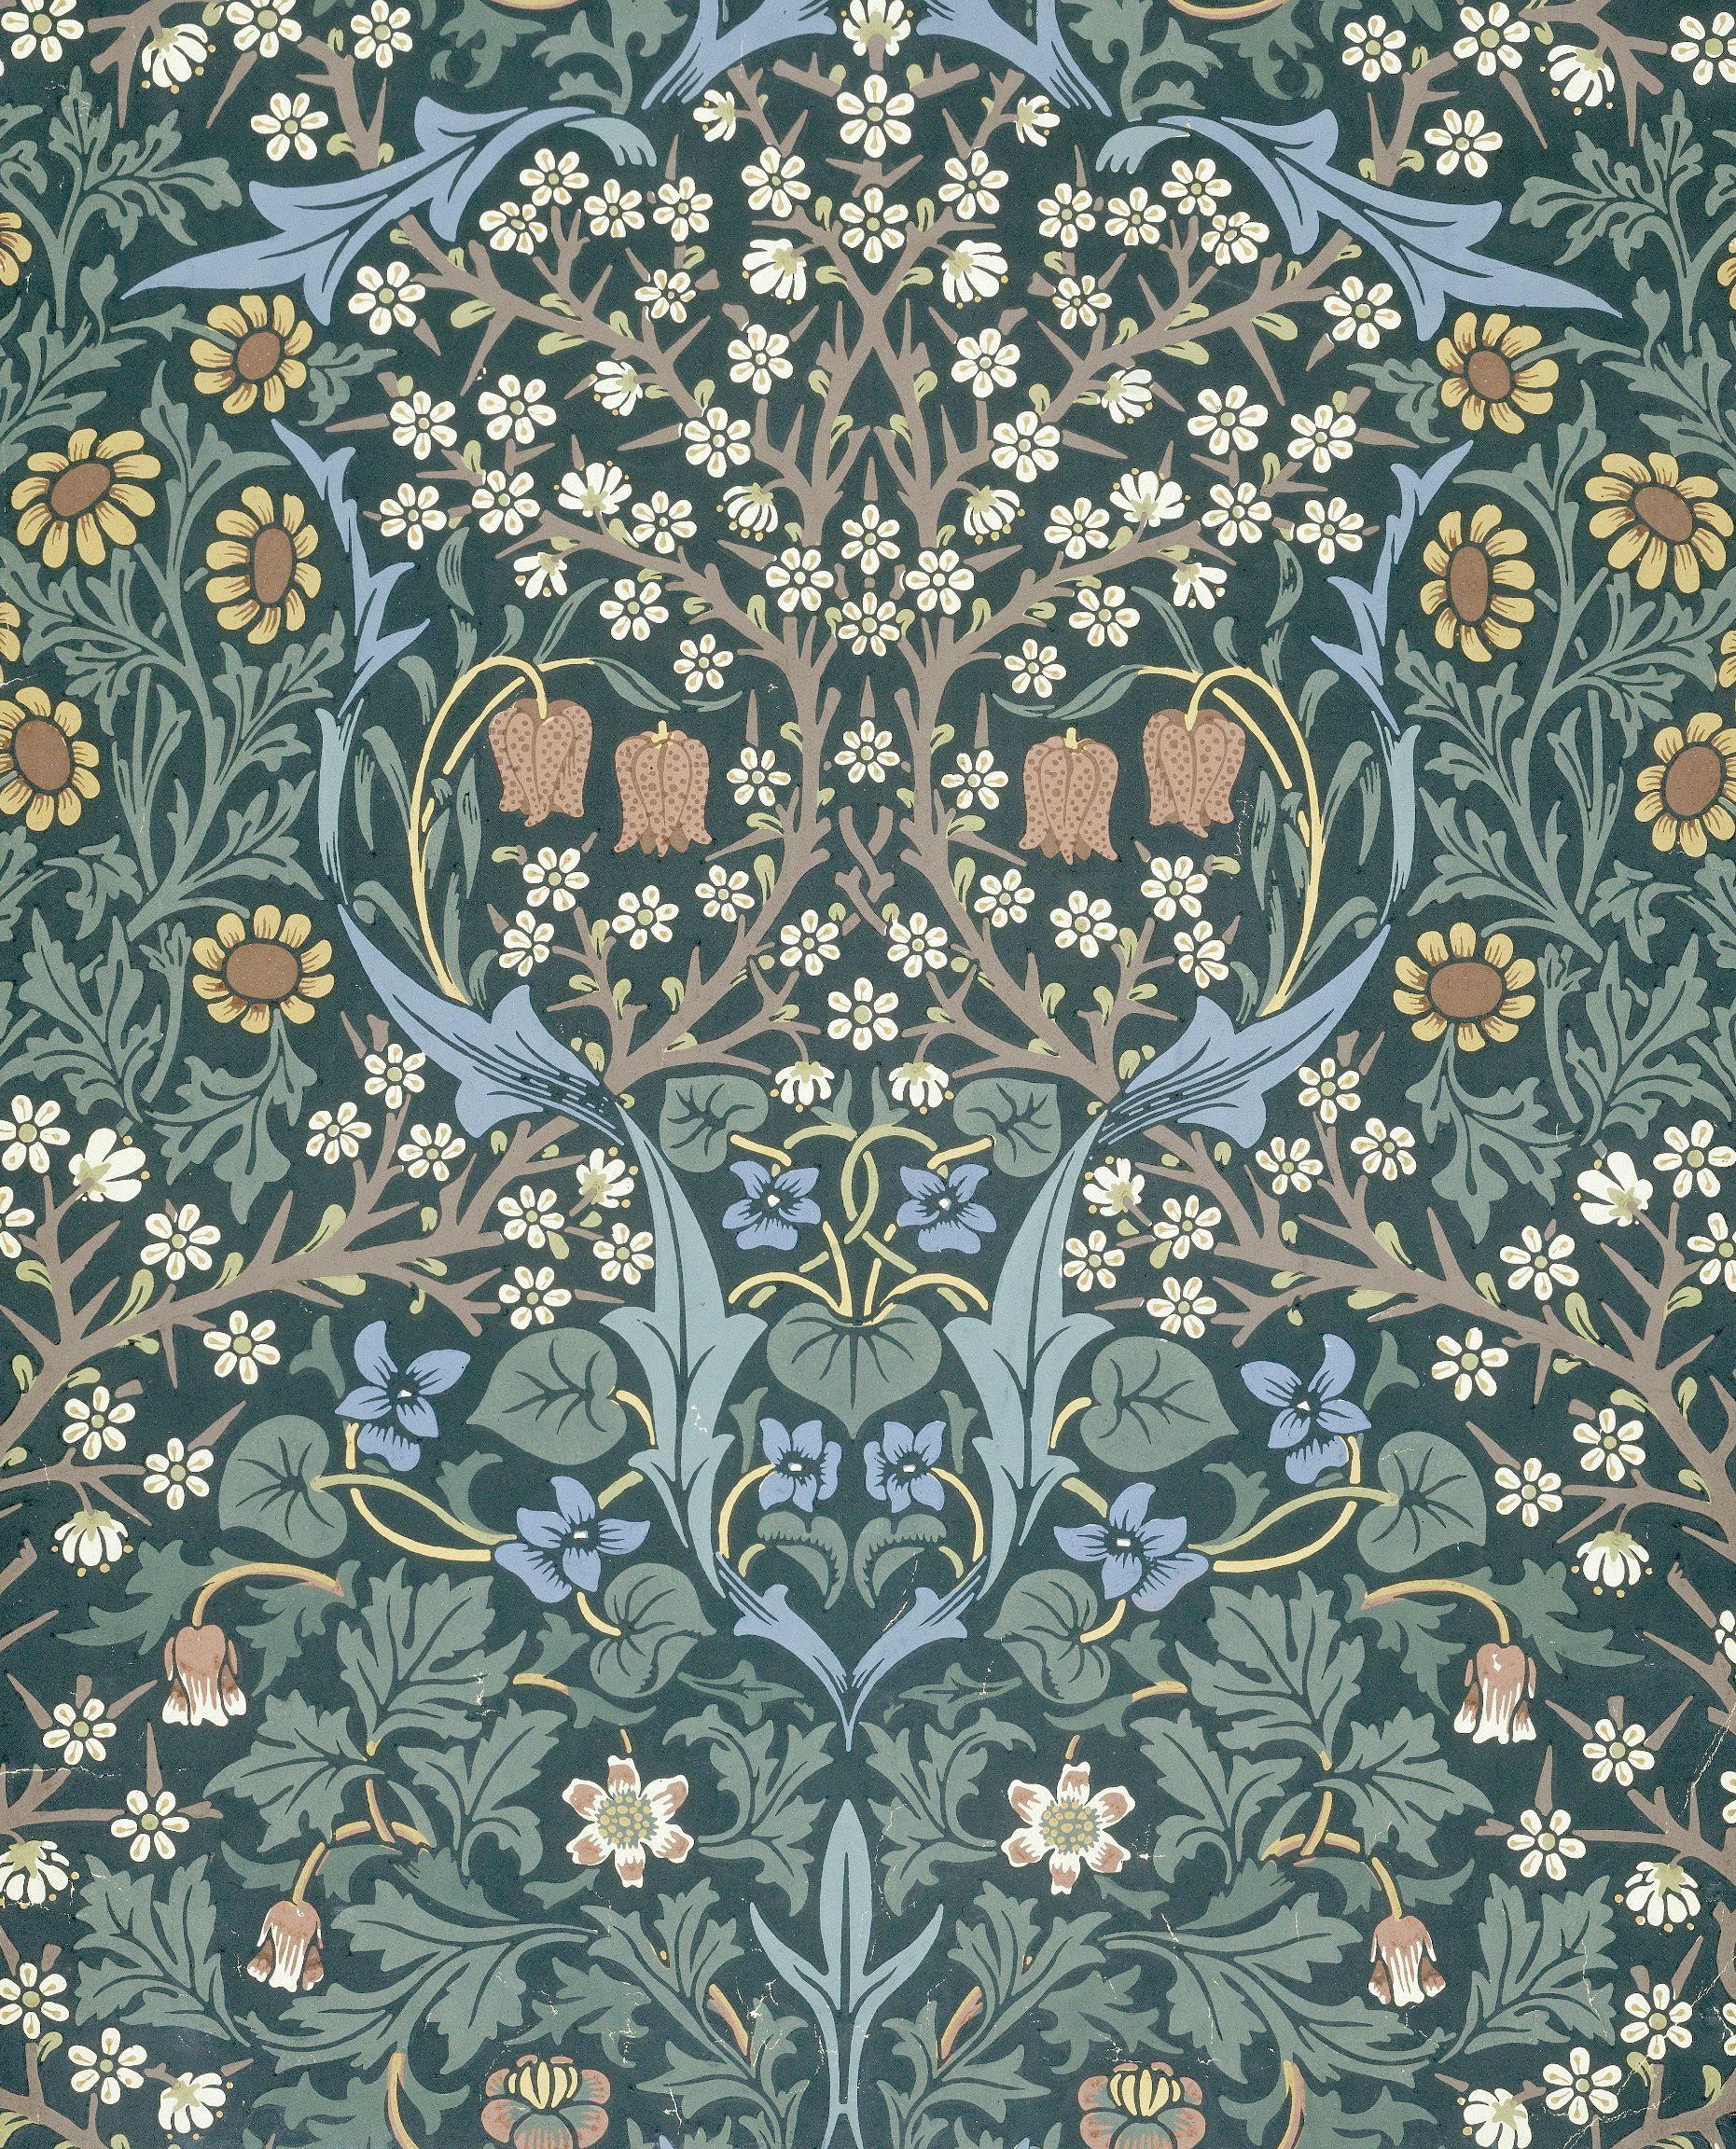 Wallpaper design by William Morris, London, 19th century ...